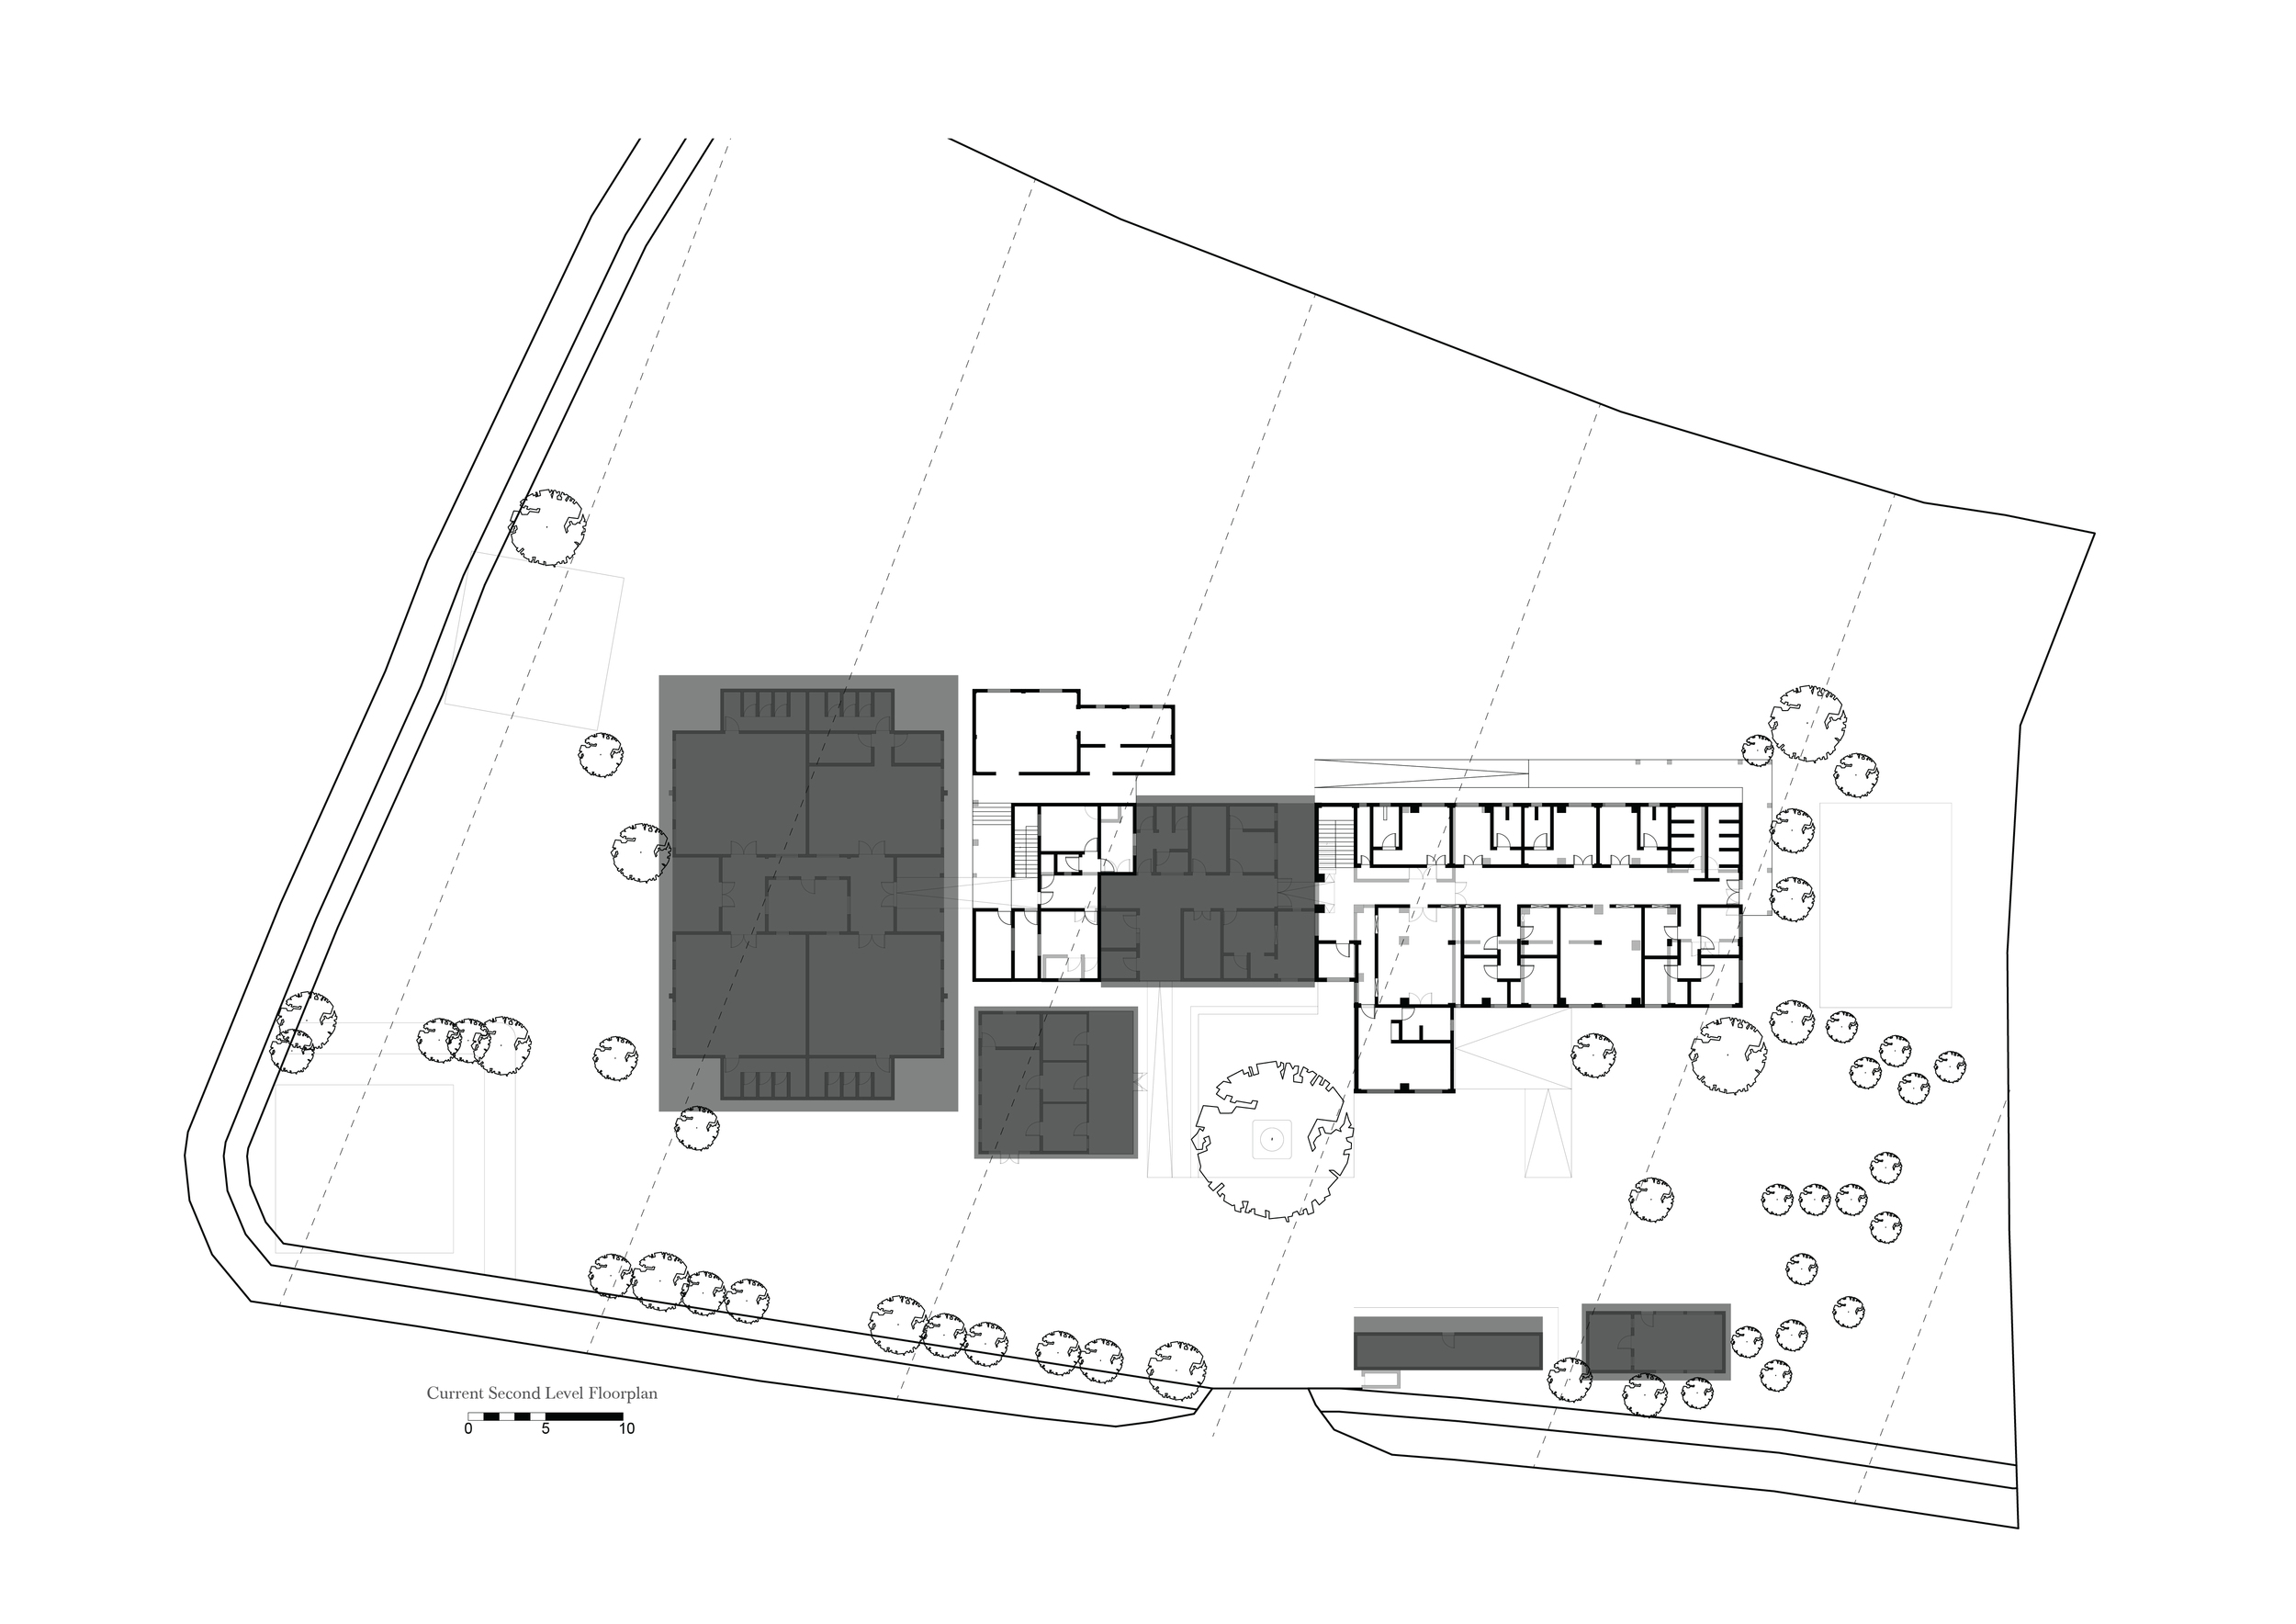 03_SagamHospital_Masterplan-02.jpg